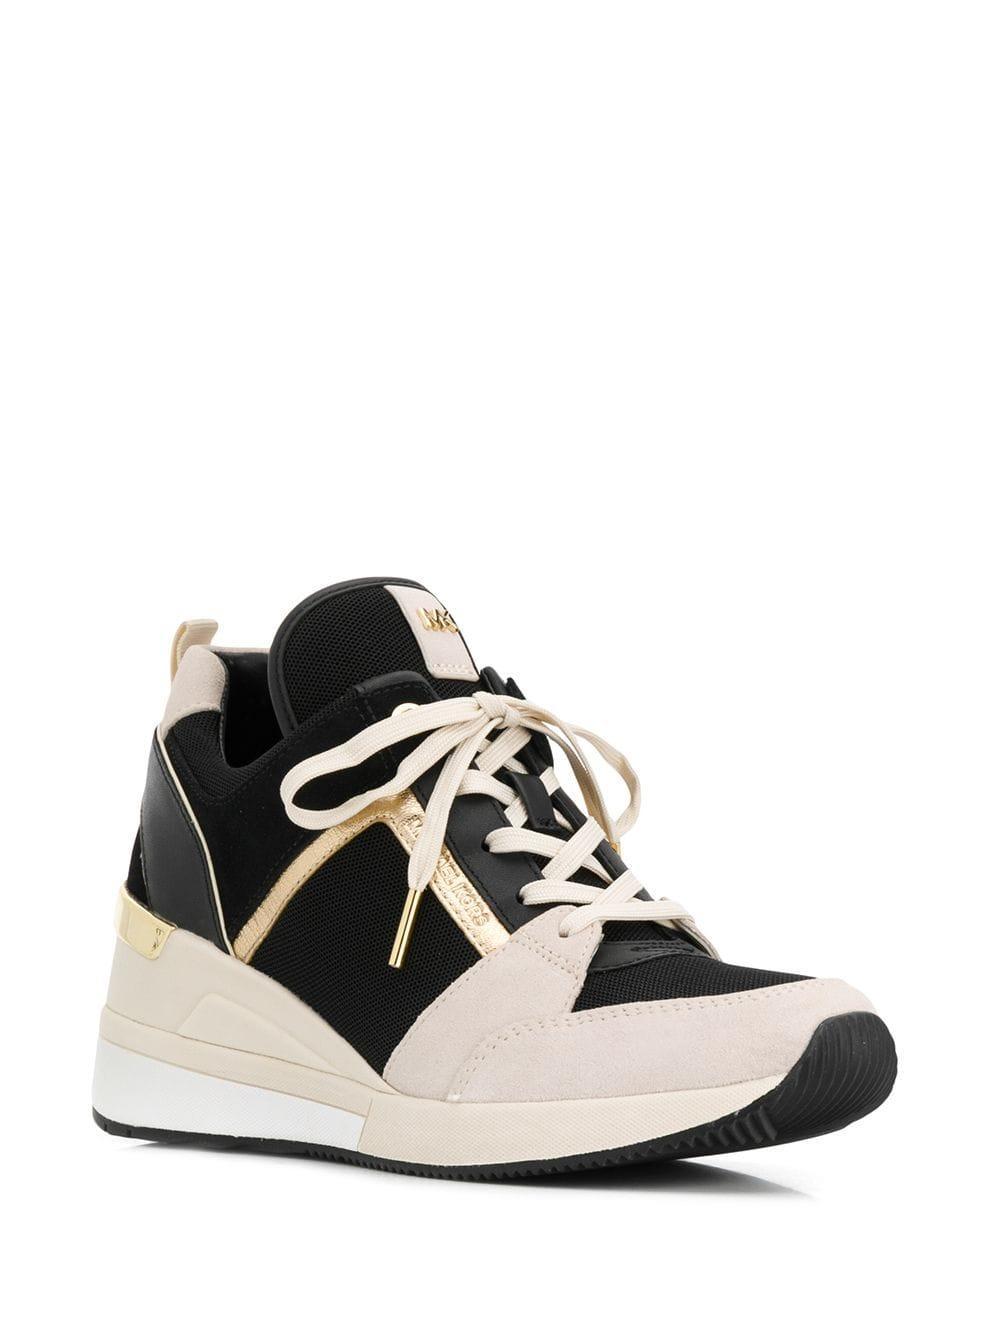 e3a000068ef Lyst - MICHAEL Michael Kors Georgie Sneakers in Black